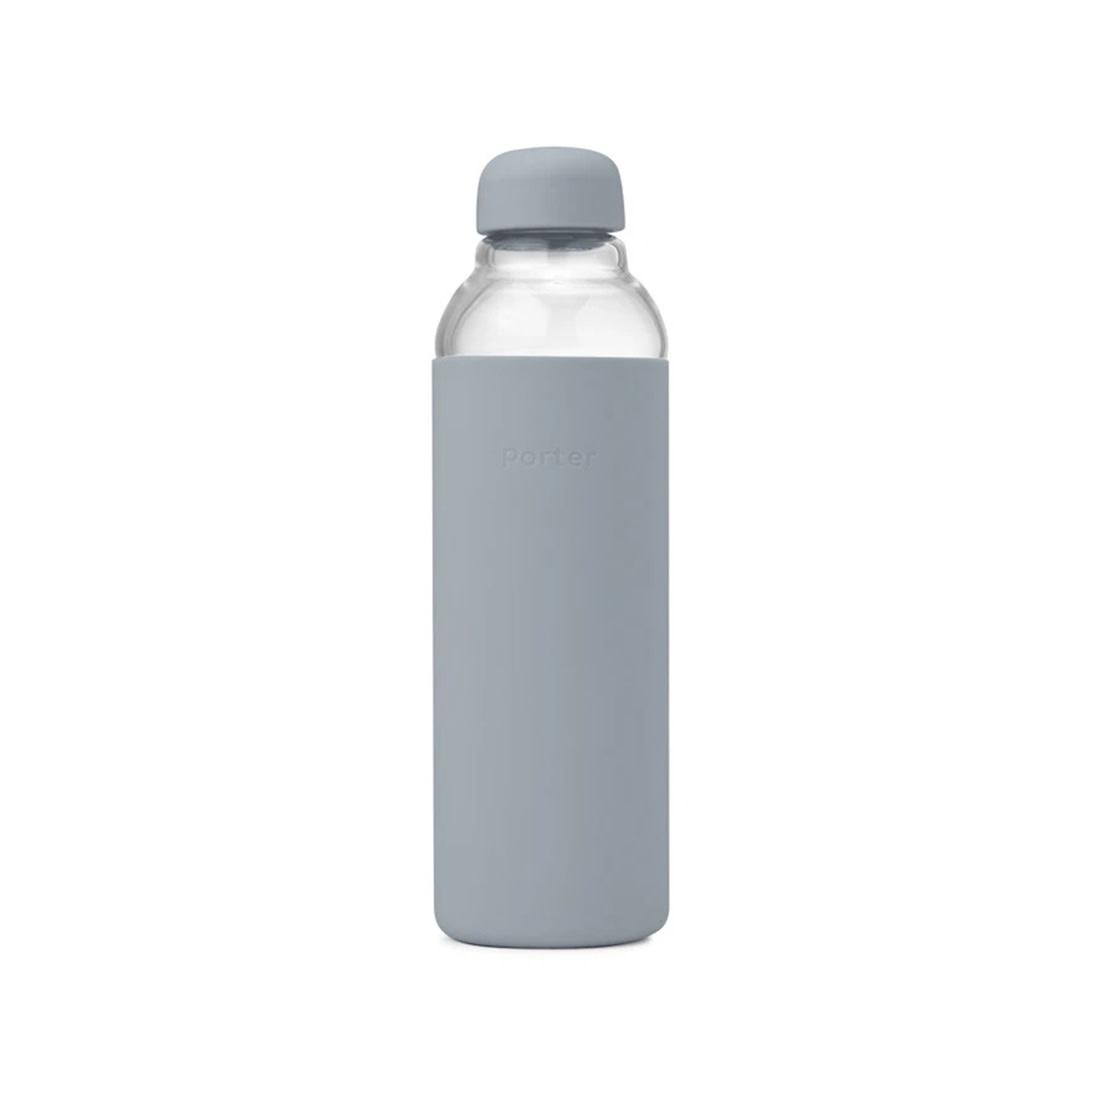 W&P DESIGN Reusable Water Bottle